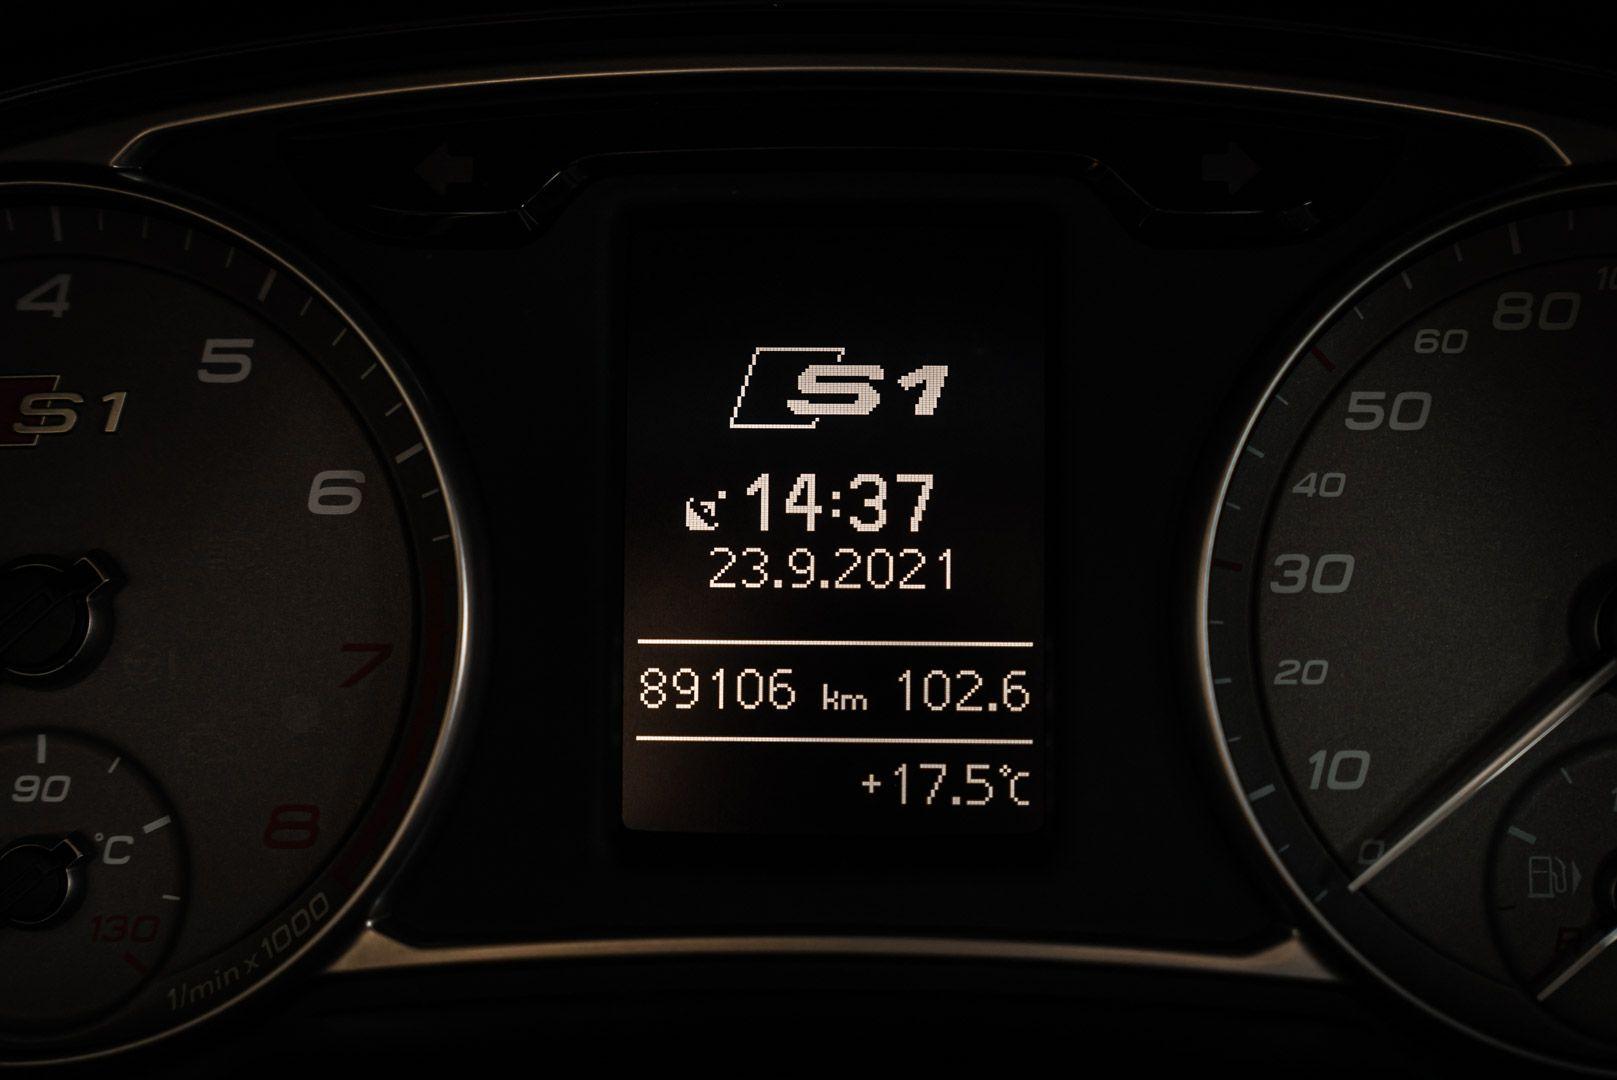 2014 Audi S1 Sportback 2.0 TFSI Quattro 83648